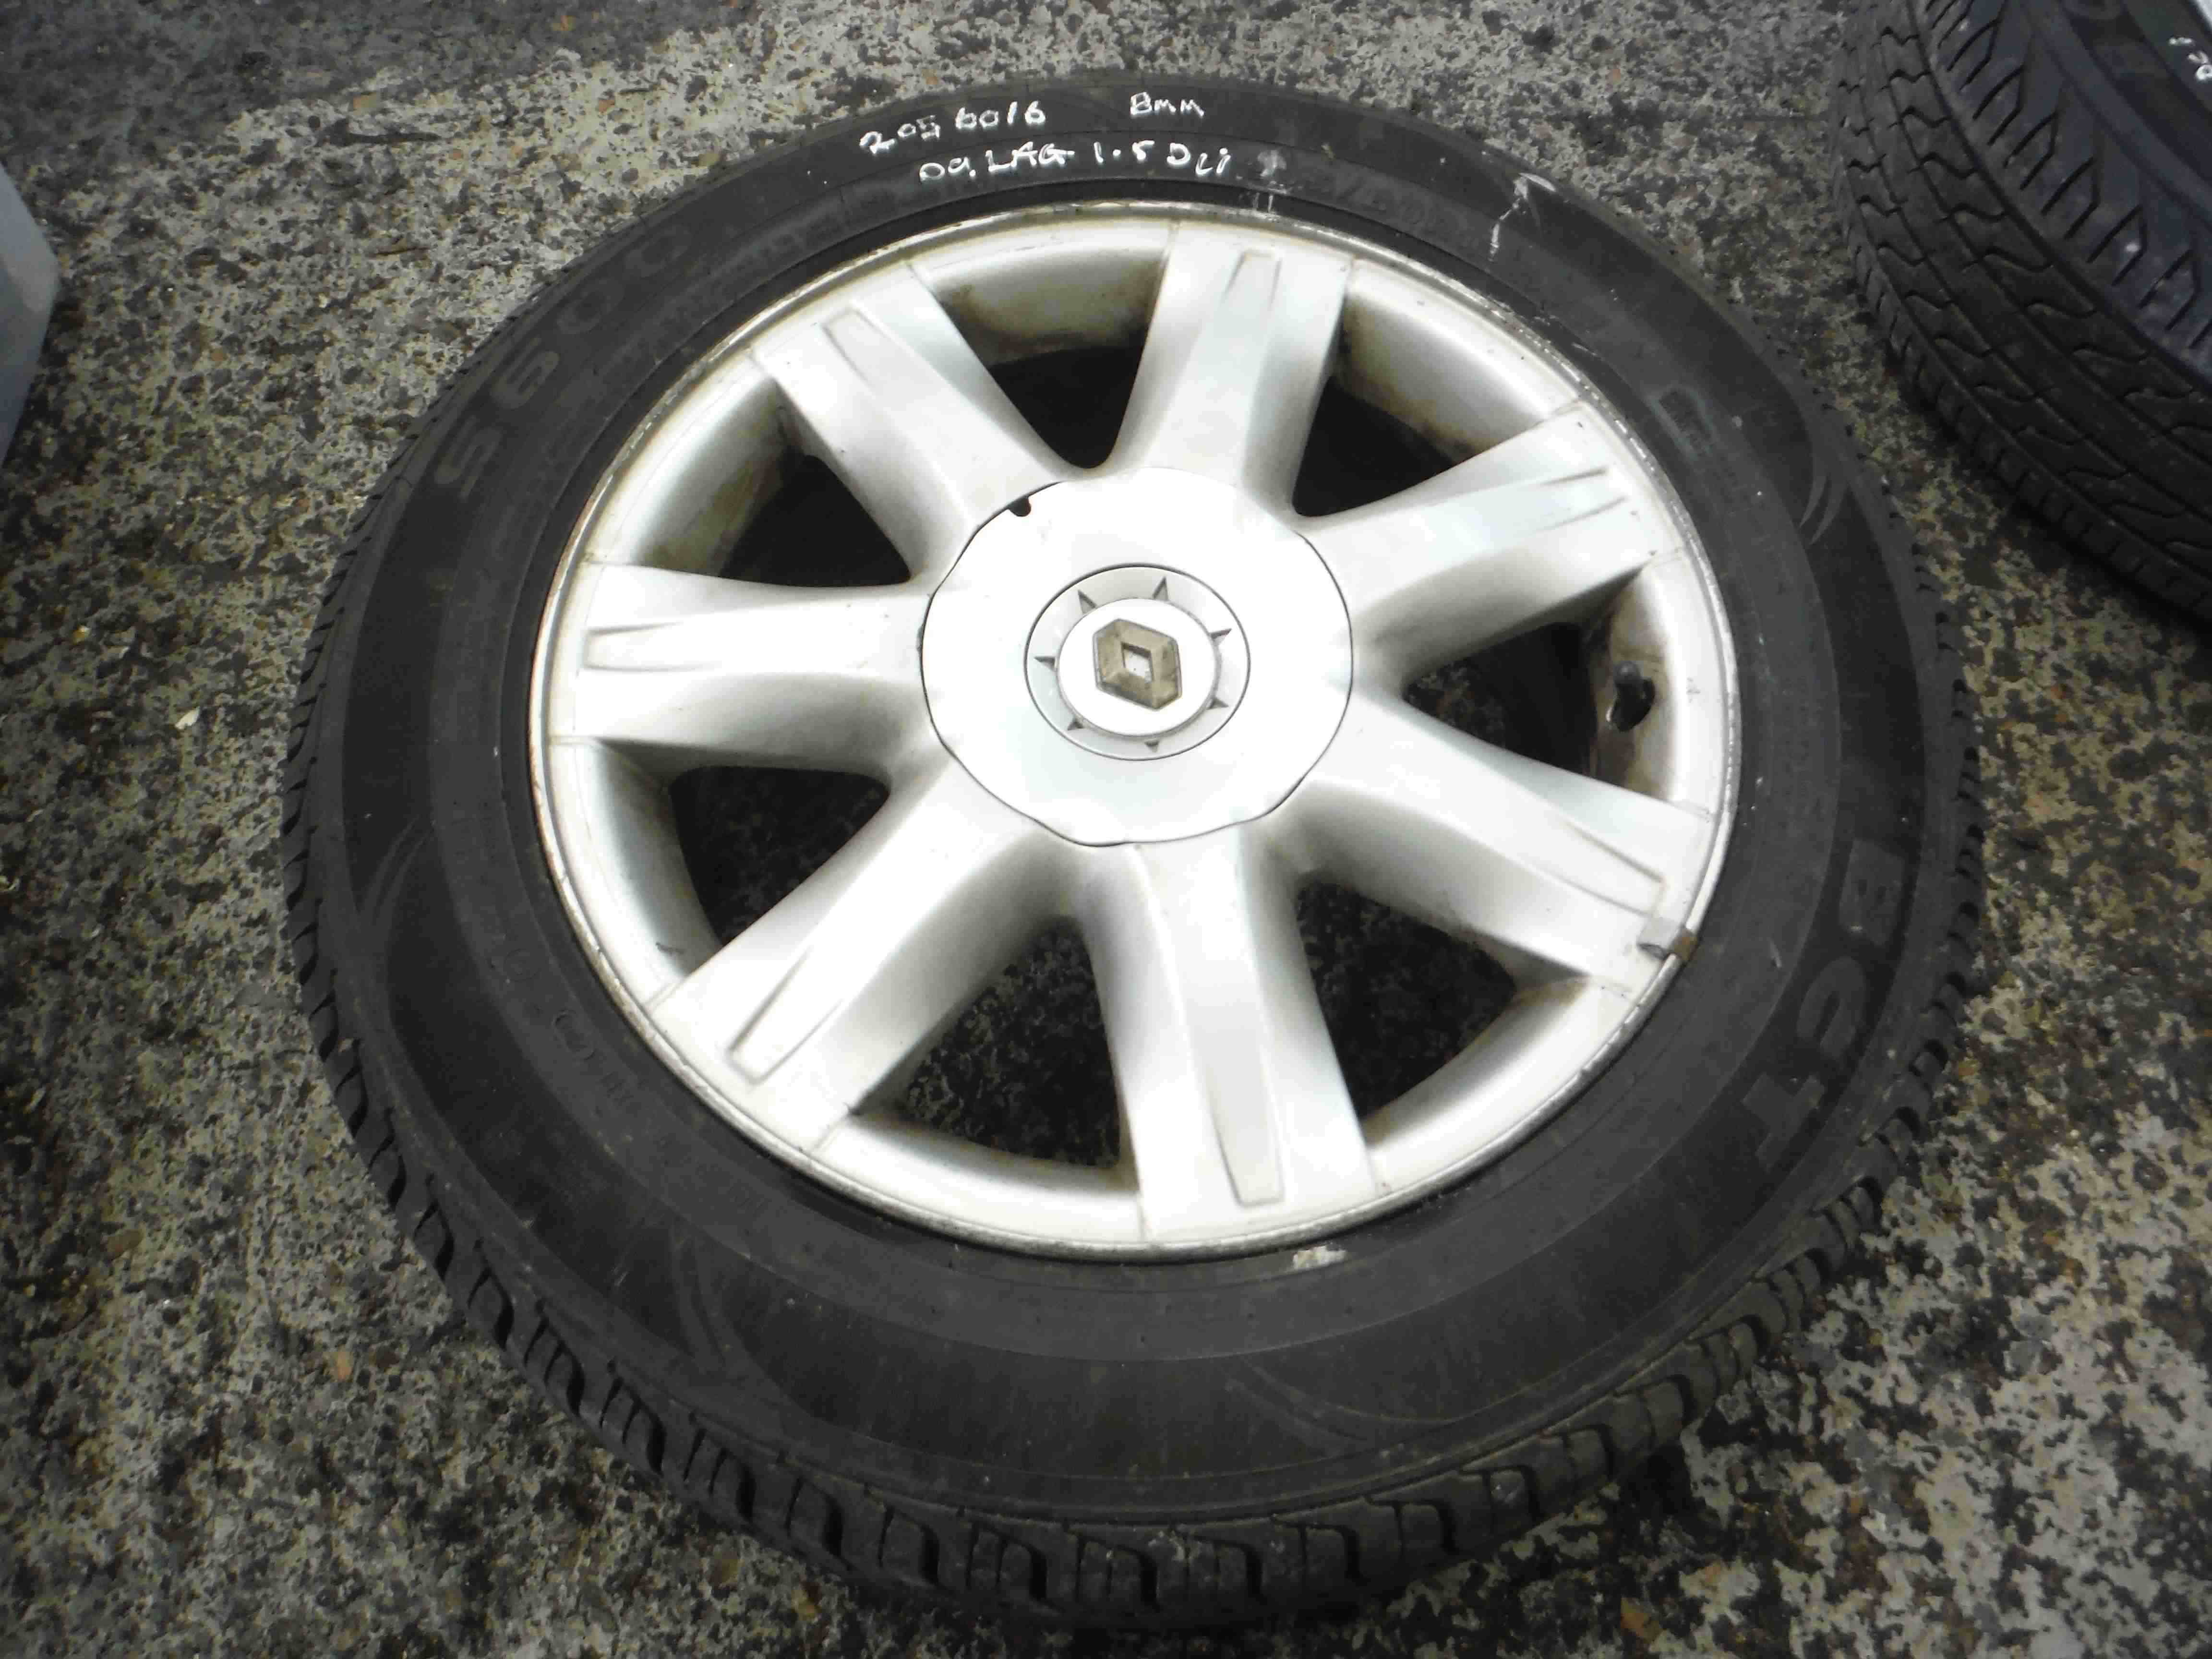 Renault Laguna MK3 2007-2010 Paradise Alloy Wheel + Tyre 3/5  205 60 16 6mm